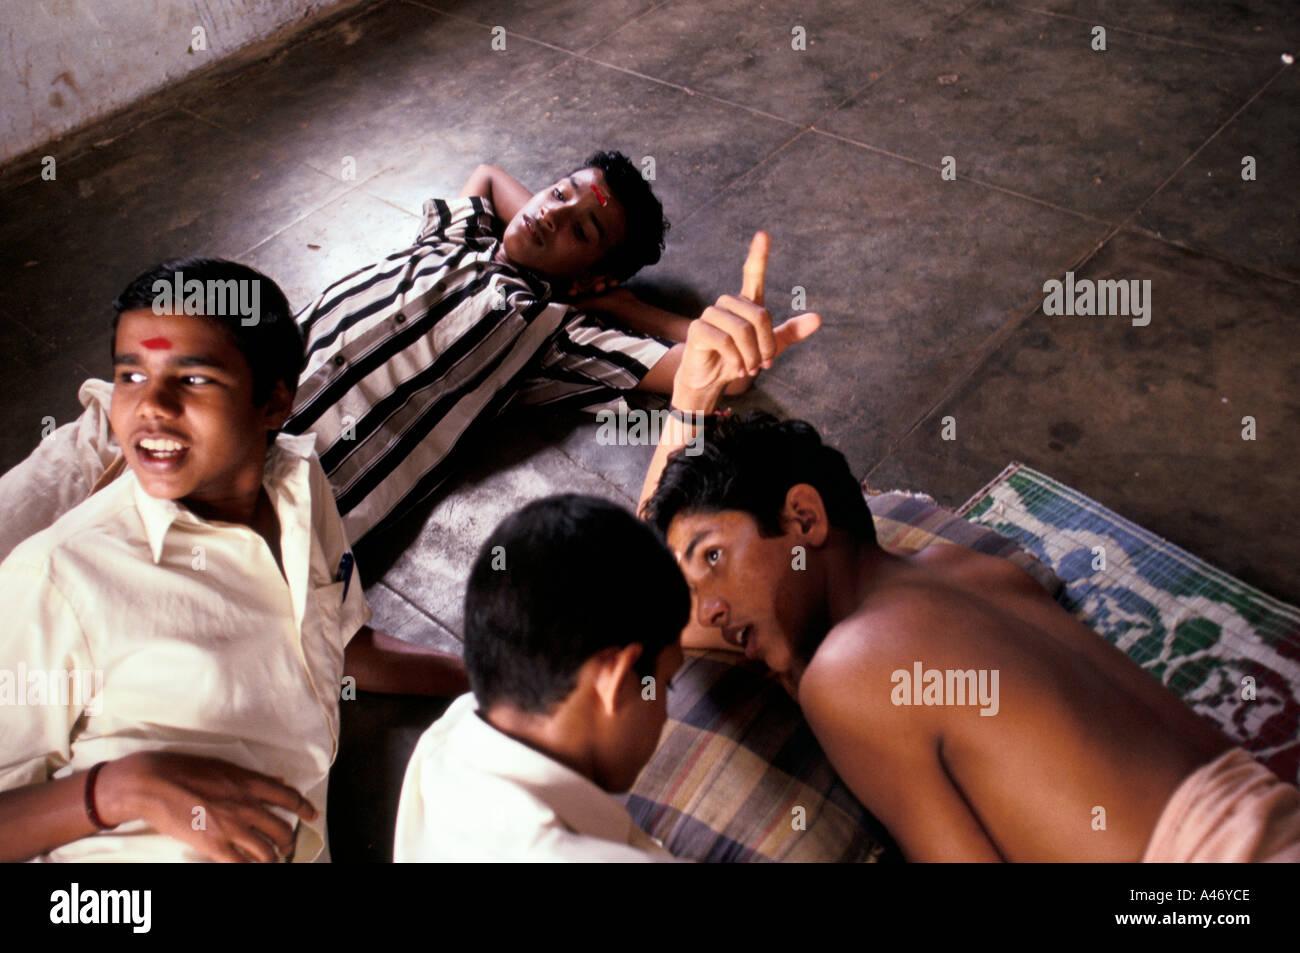 Kathakali students relax on the floor at The Kerala Kalamandalam, the state academy for Kathakali, Kerala, India - Stock Image